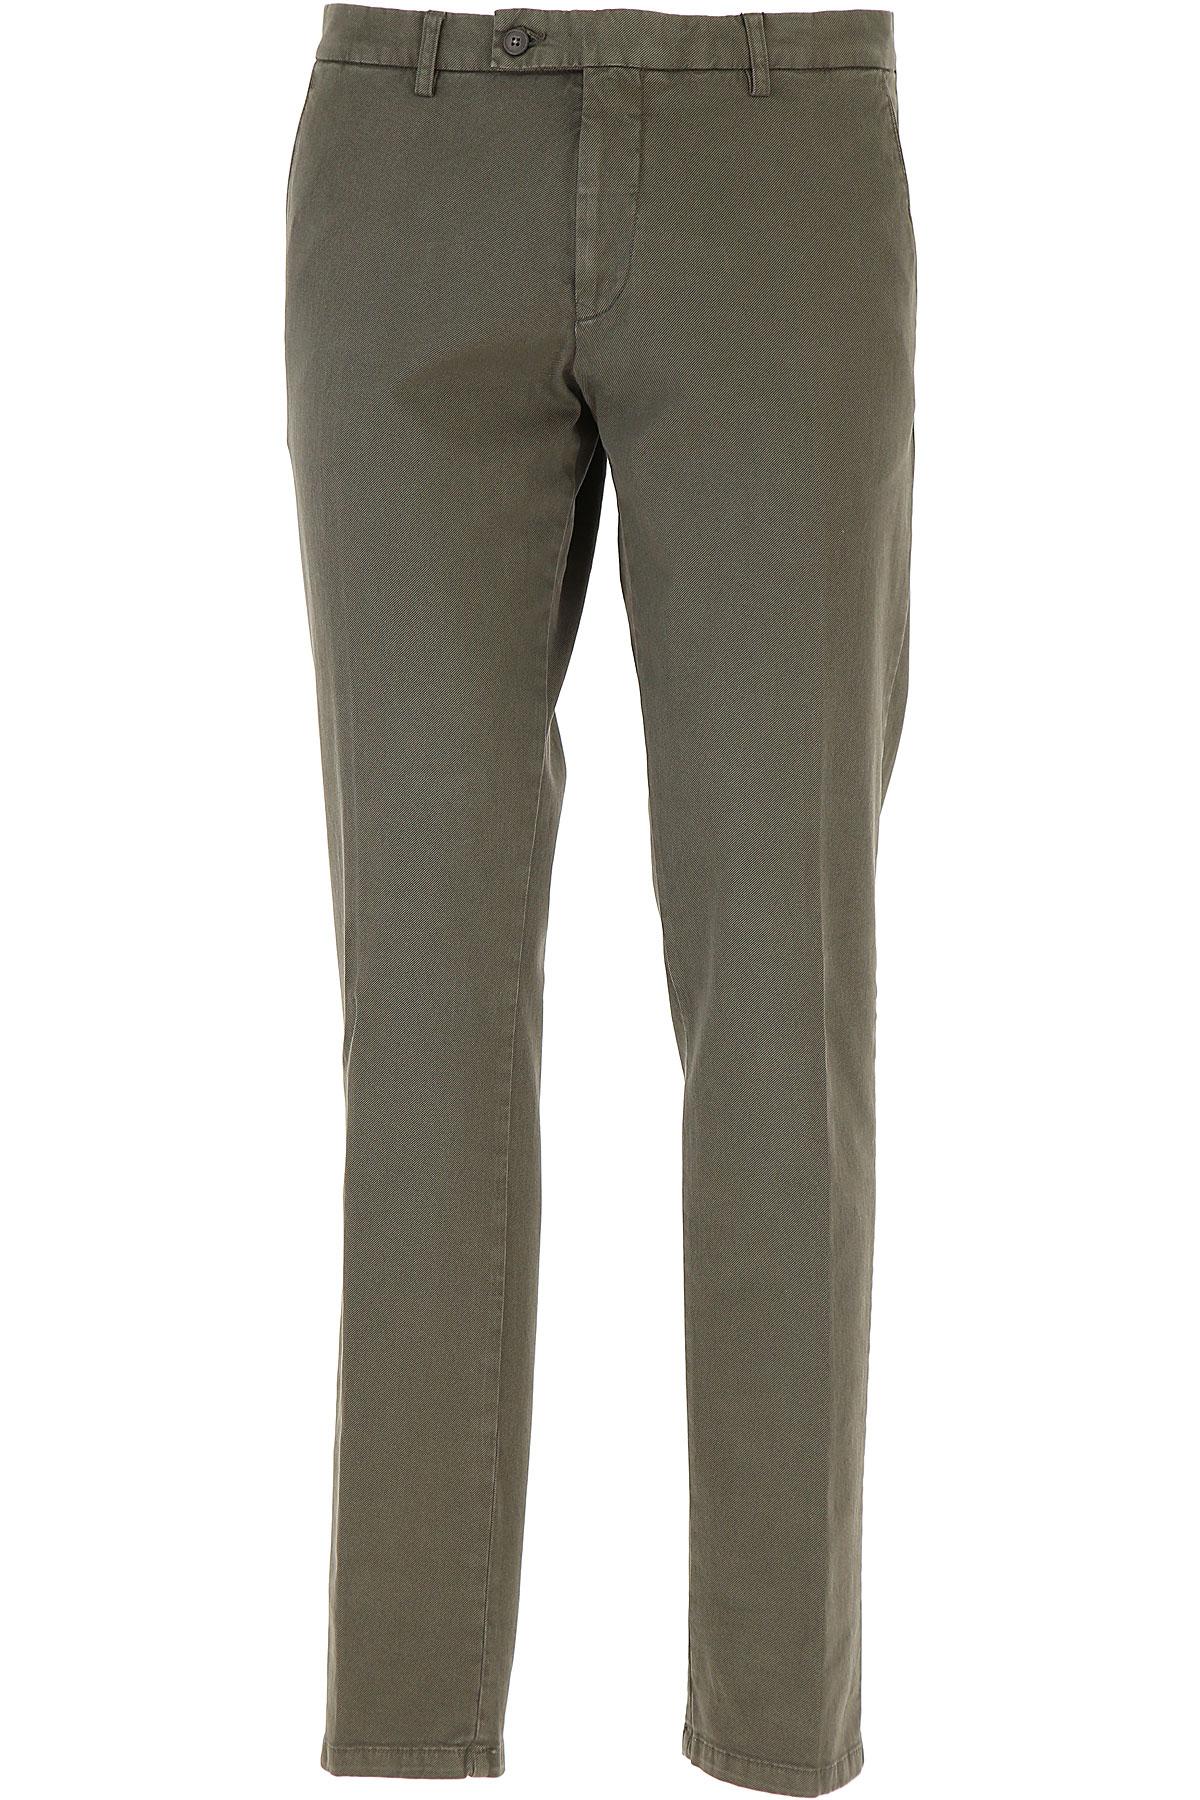 Image of Berwich Pants for Men, Olive, Cotton, 2017, 30 36